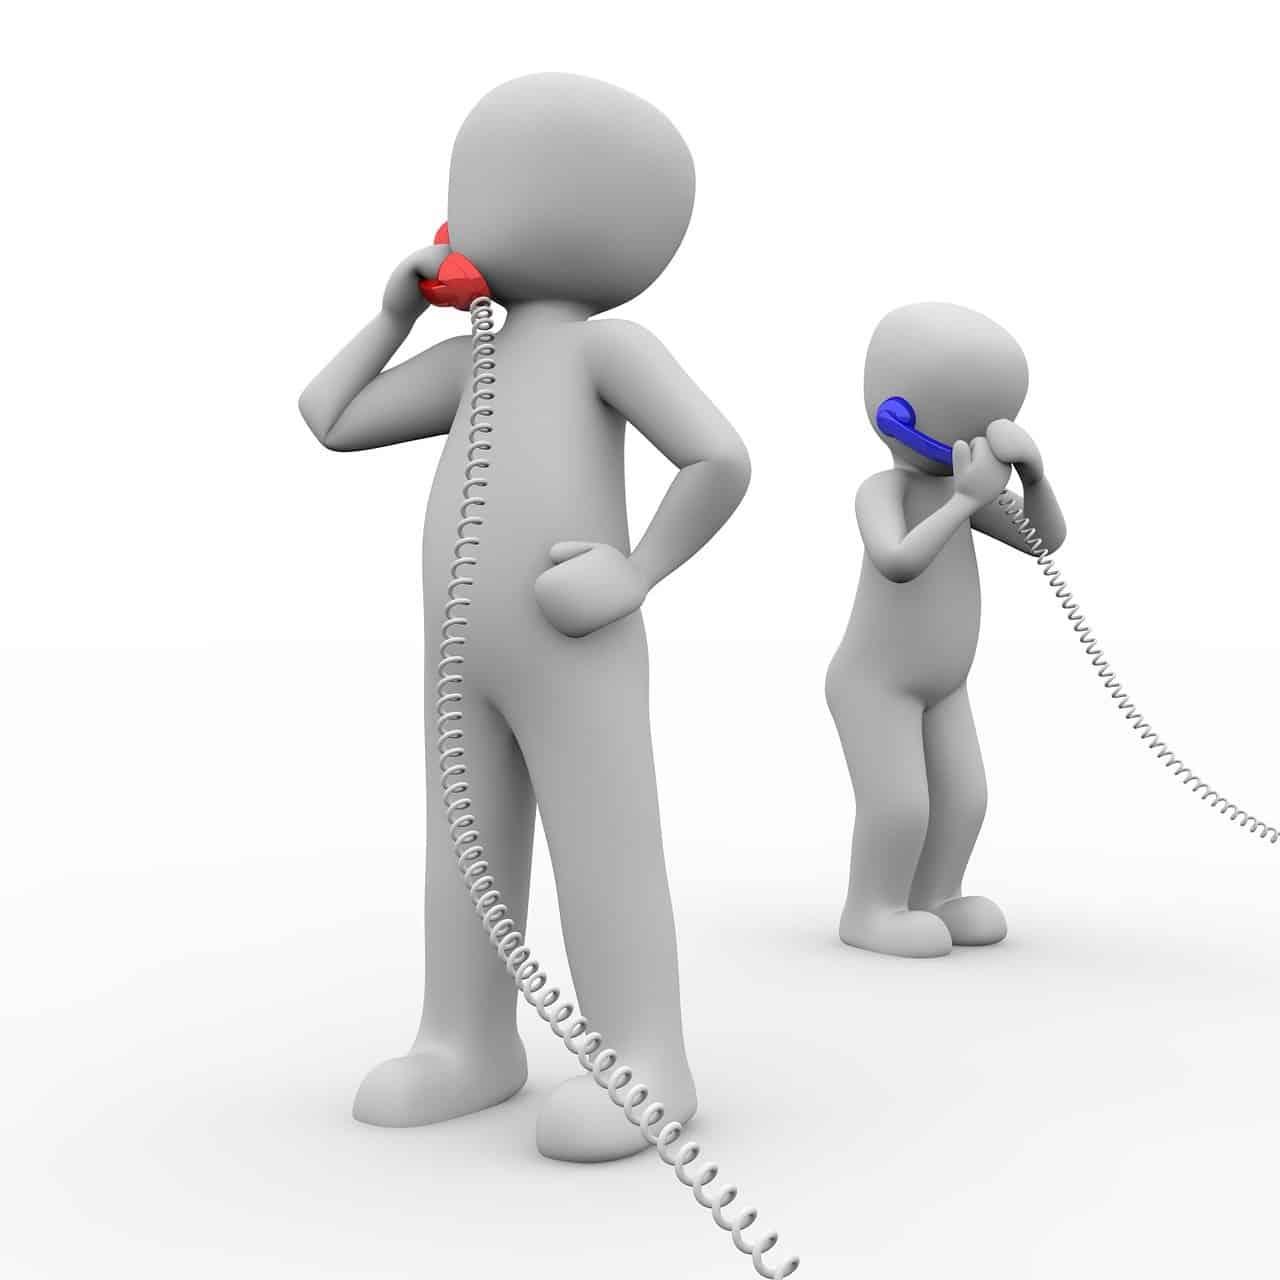 Telefontraining – Kommunikation am Telefon